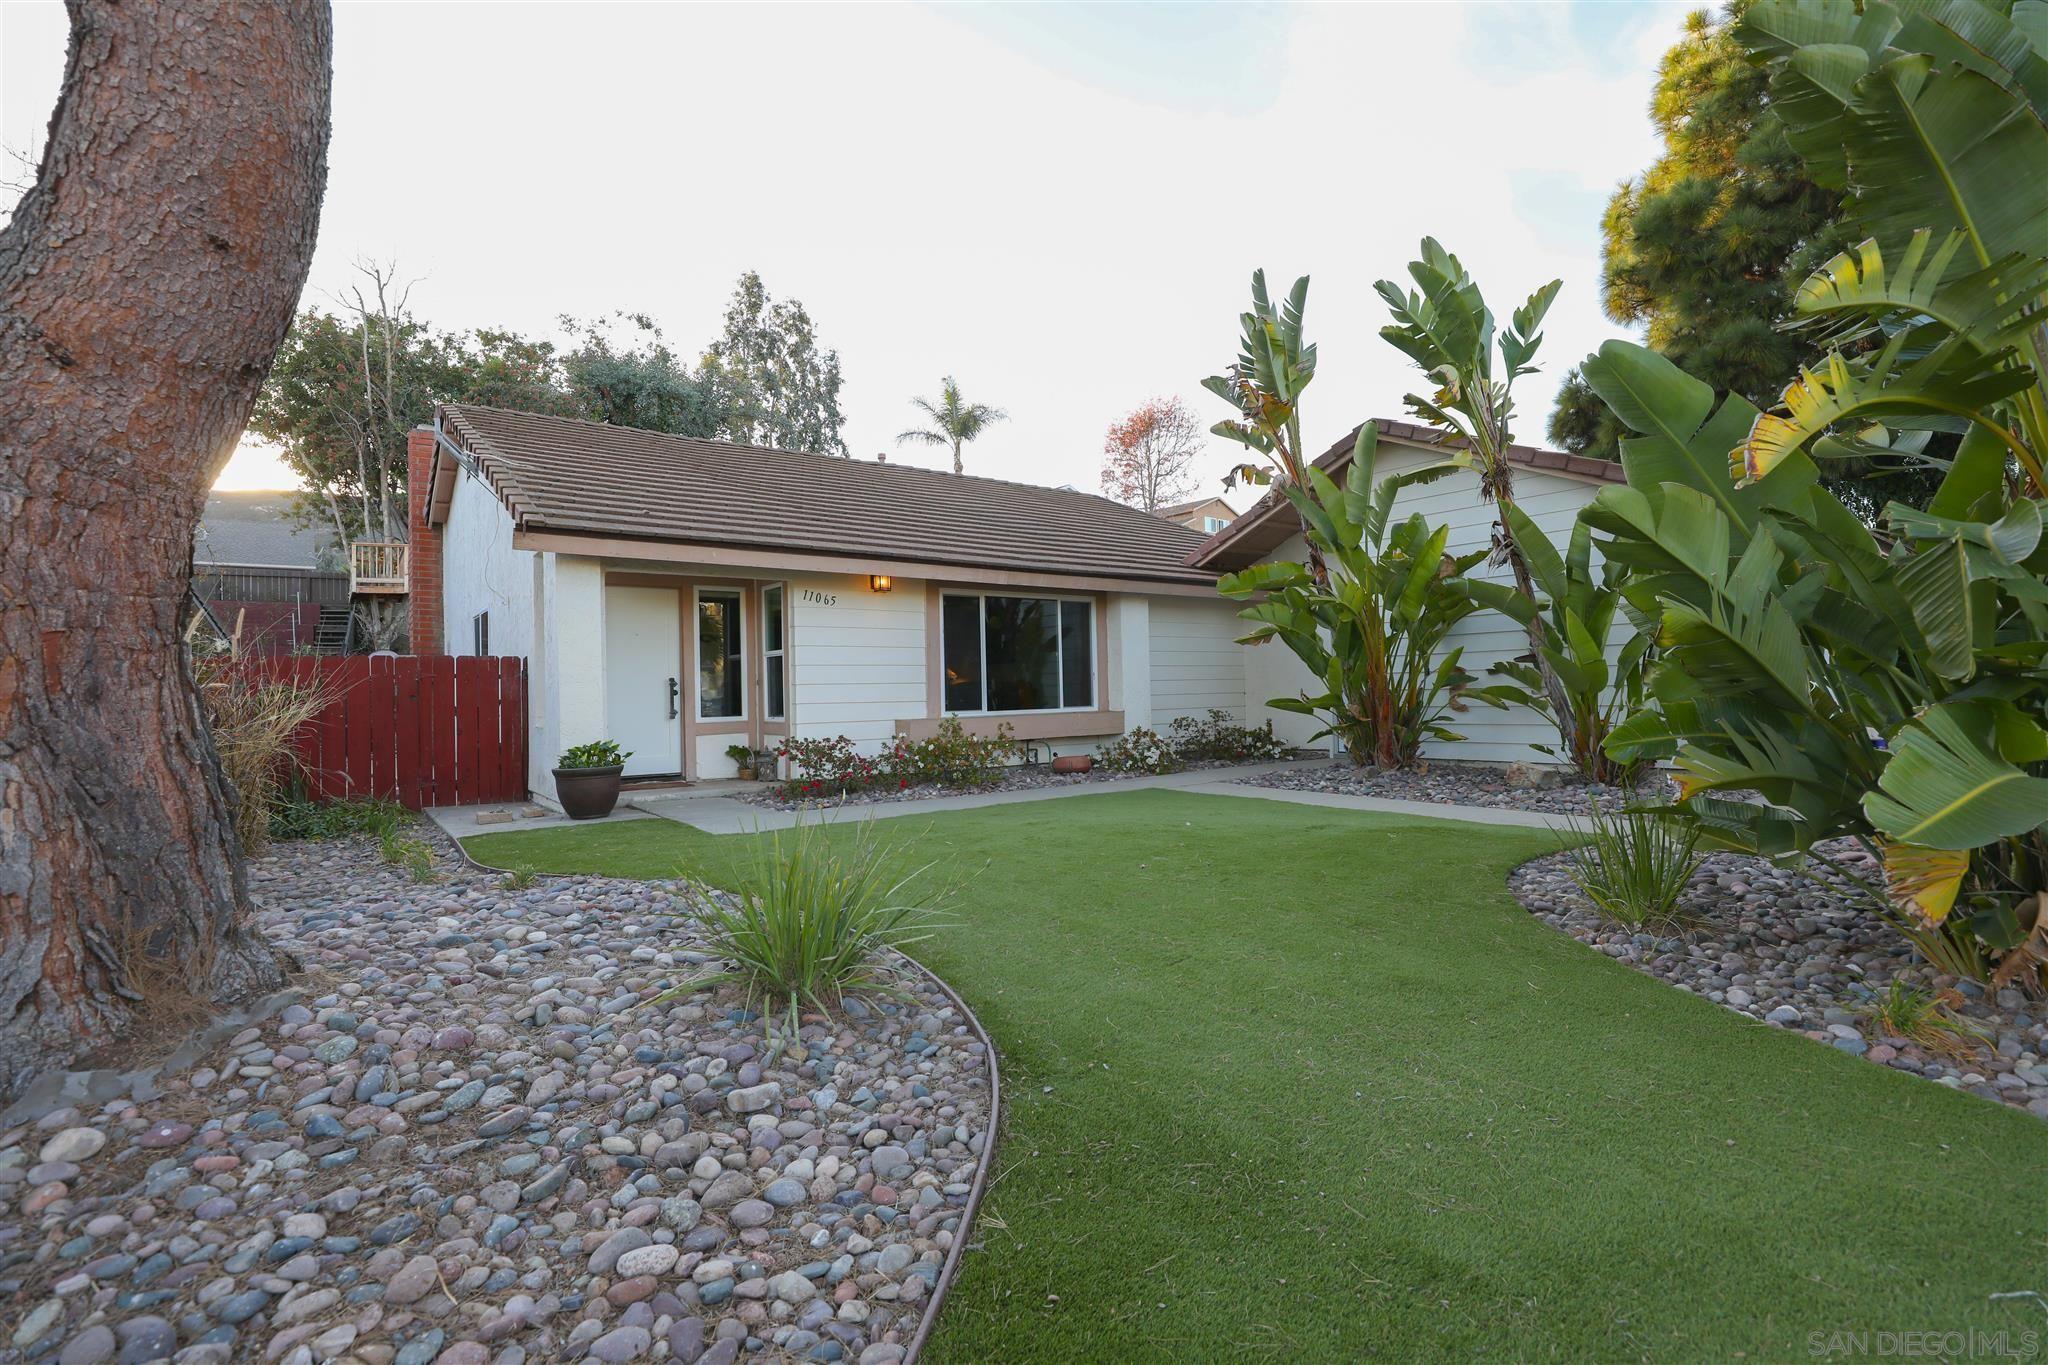 Main Photo: RANCHO BERNARDO House for sale : 3 bedrooms : 11065 Autillo Way in San Diego